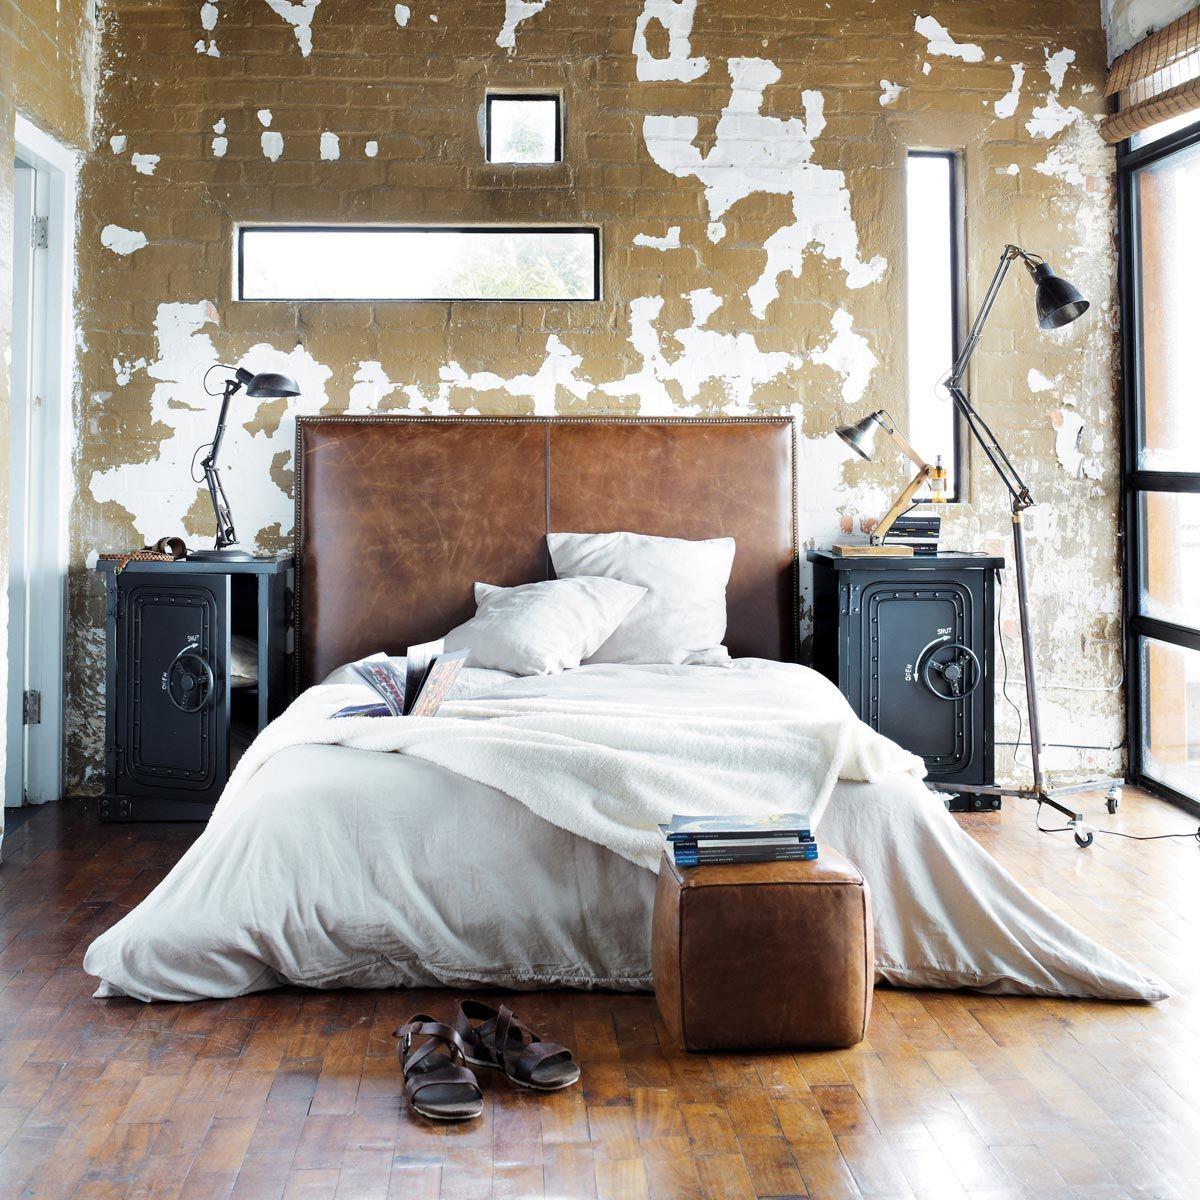 Cabecero de cuero dormitorio de aire bohemio y masculino de maison du monde bedroom chic - Testate letto maison du monde ...